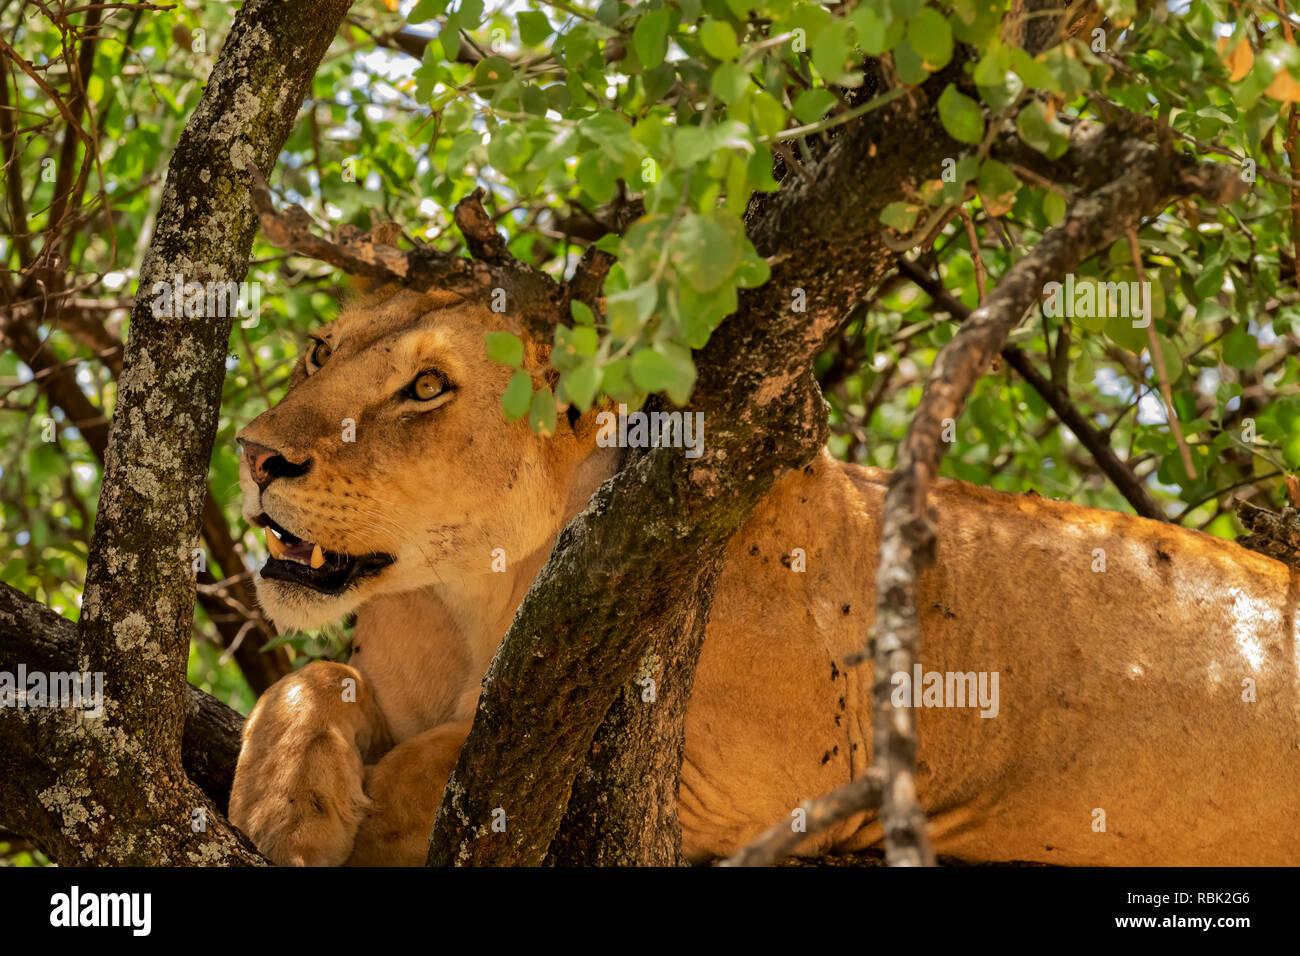 African Lion (Panthera leo) female resting in a tree in Lake Manyara National Park, Tanzania - Stock Image